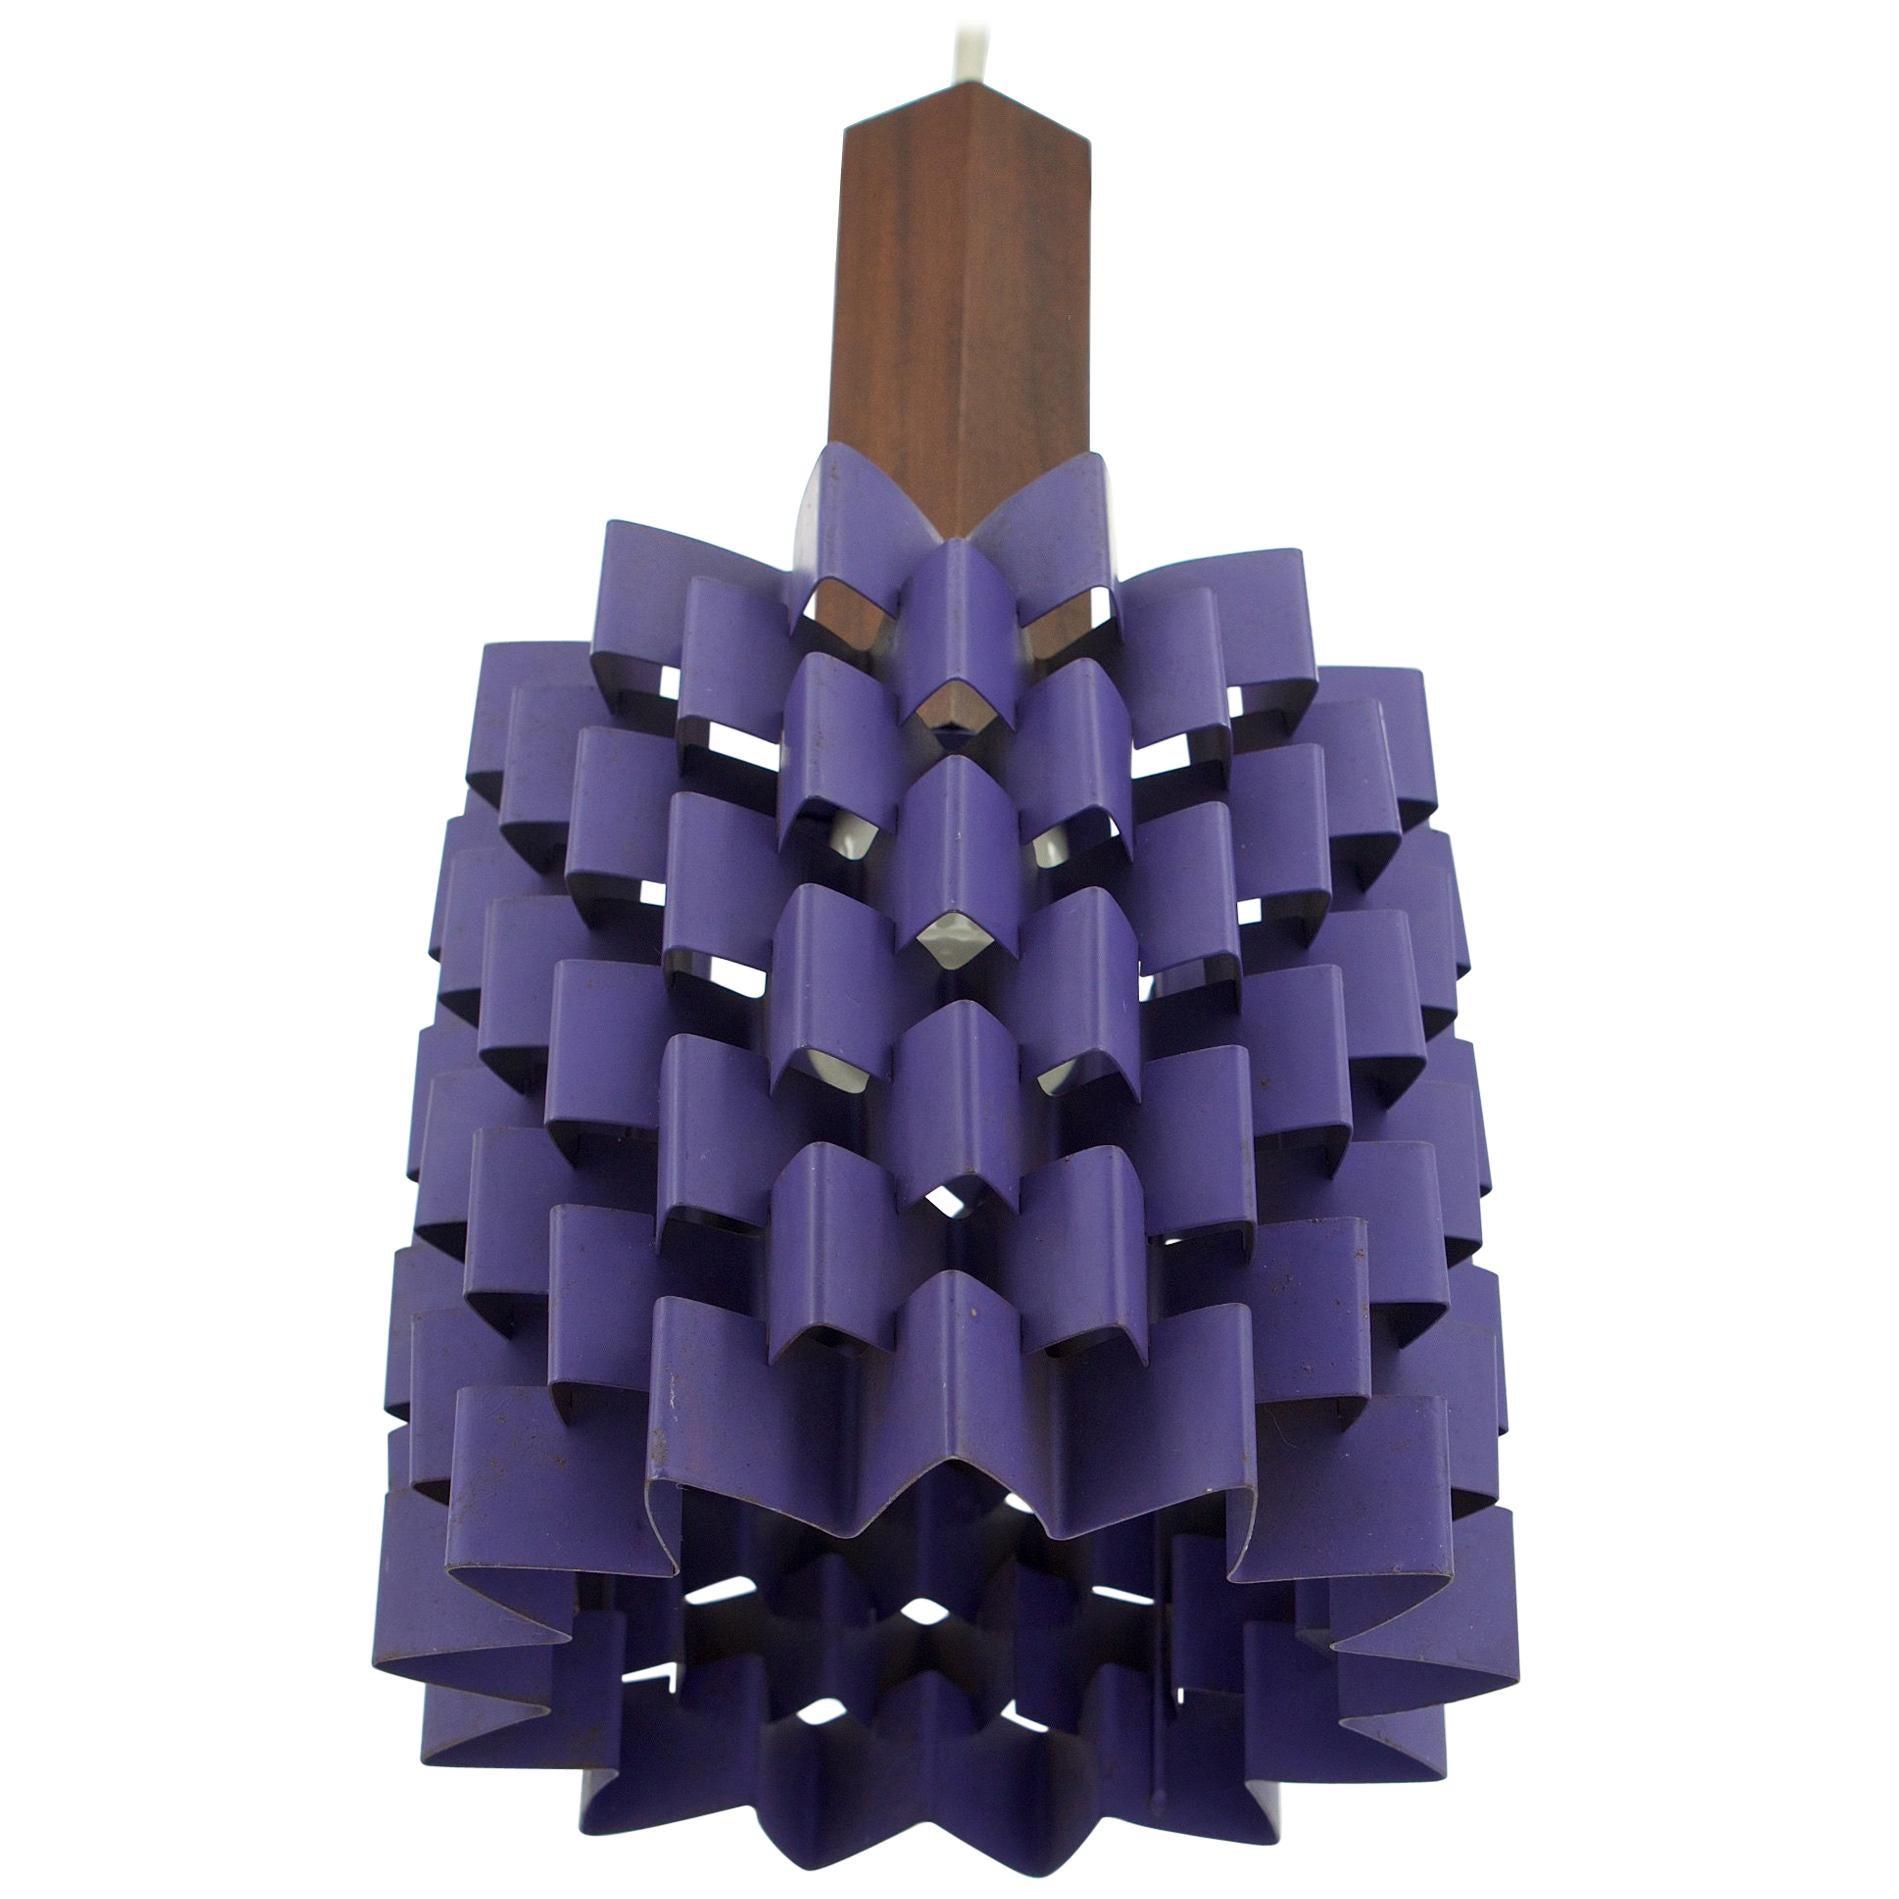 1960s Hanging Purple Pineapple Pendant Lamp with Teak Lyfa Folsgaard Danish